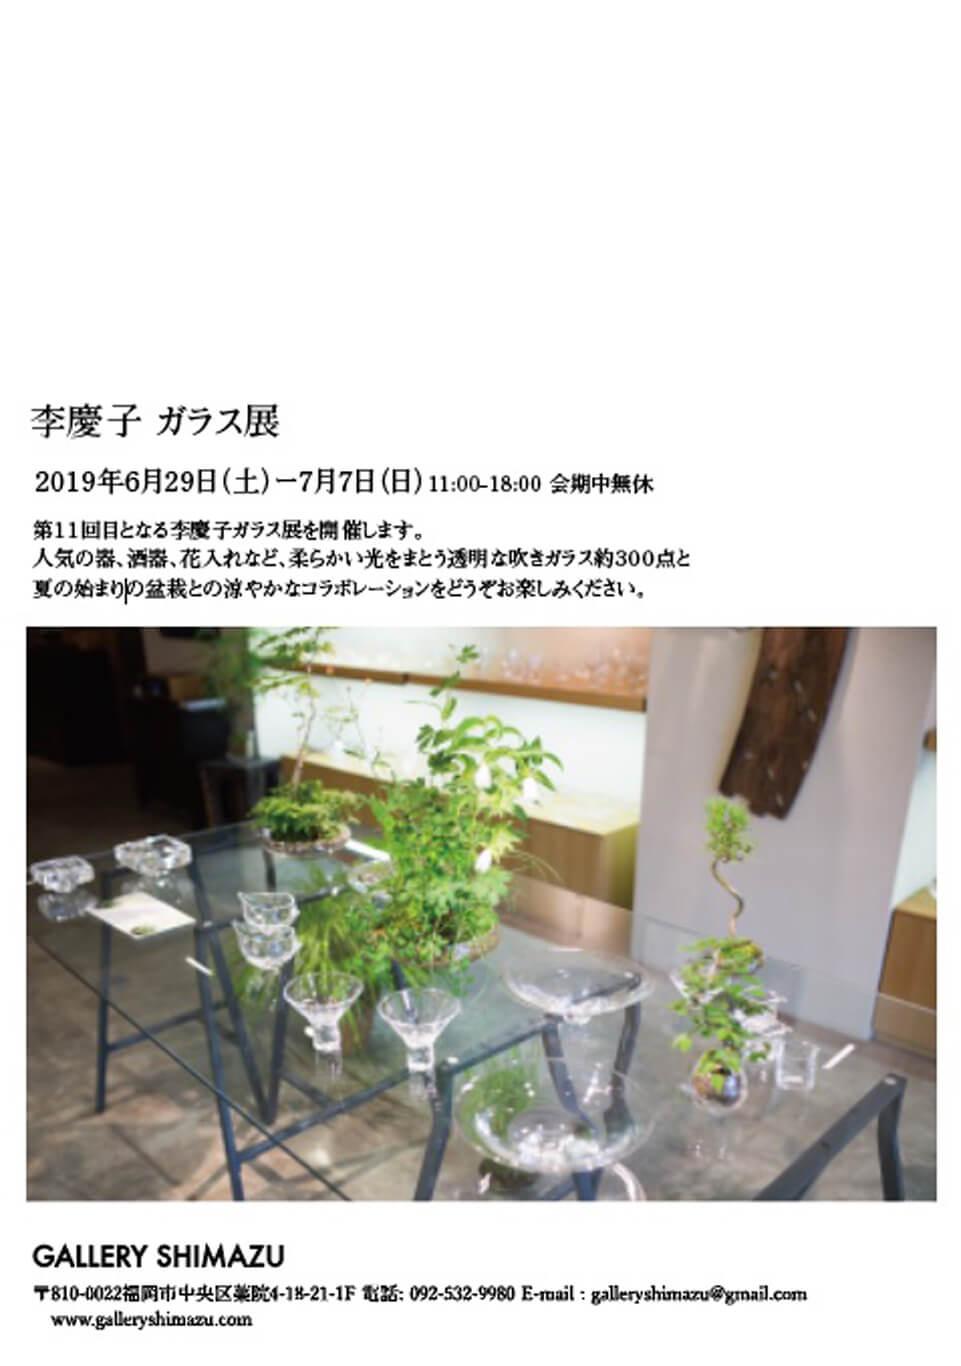 shimazu-201906-李慶子-ガラス展1